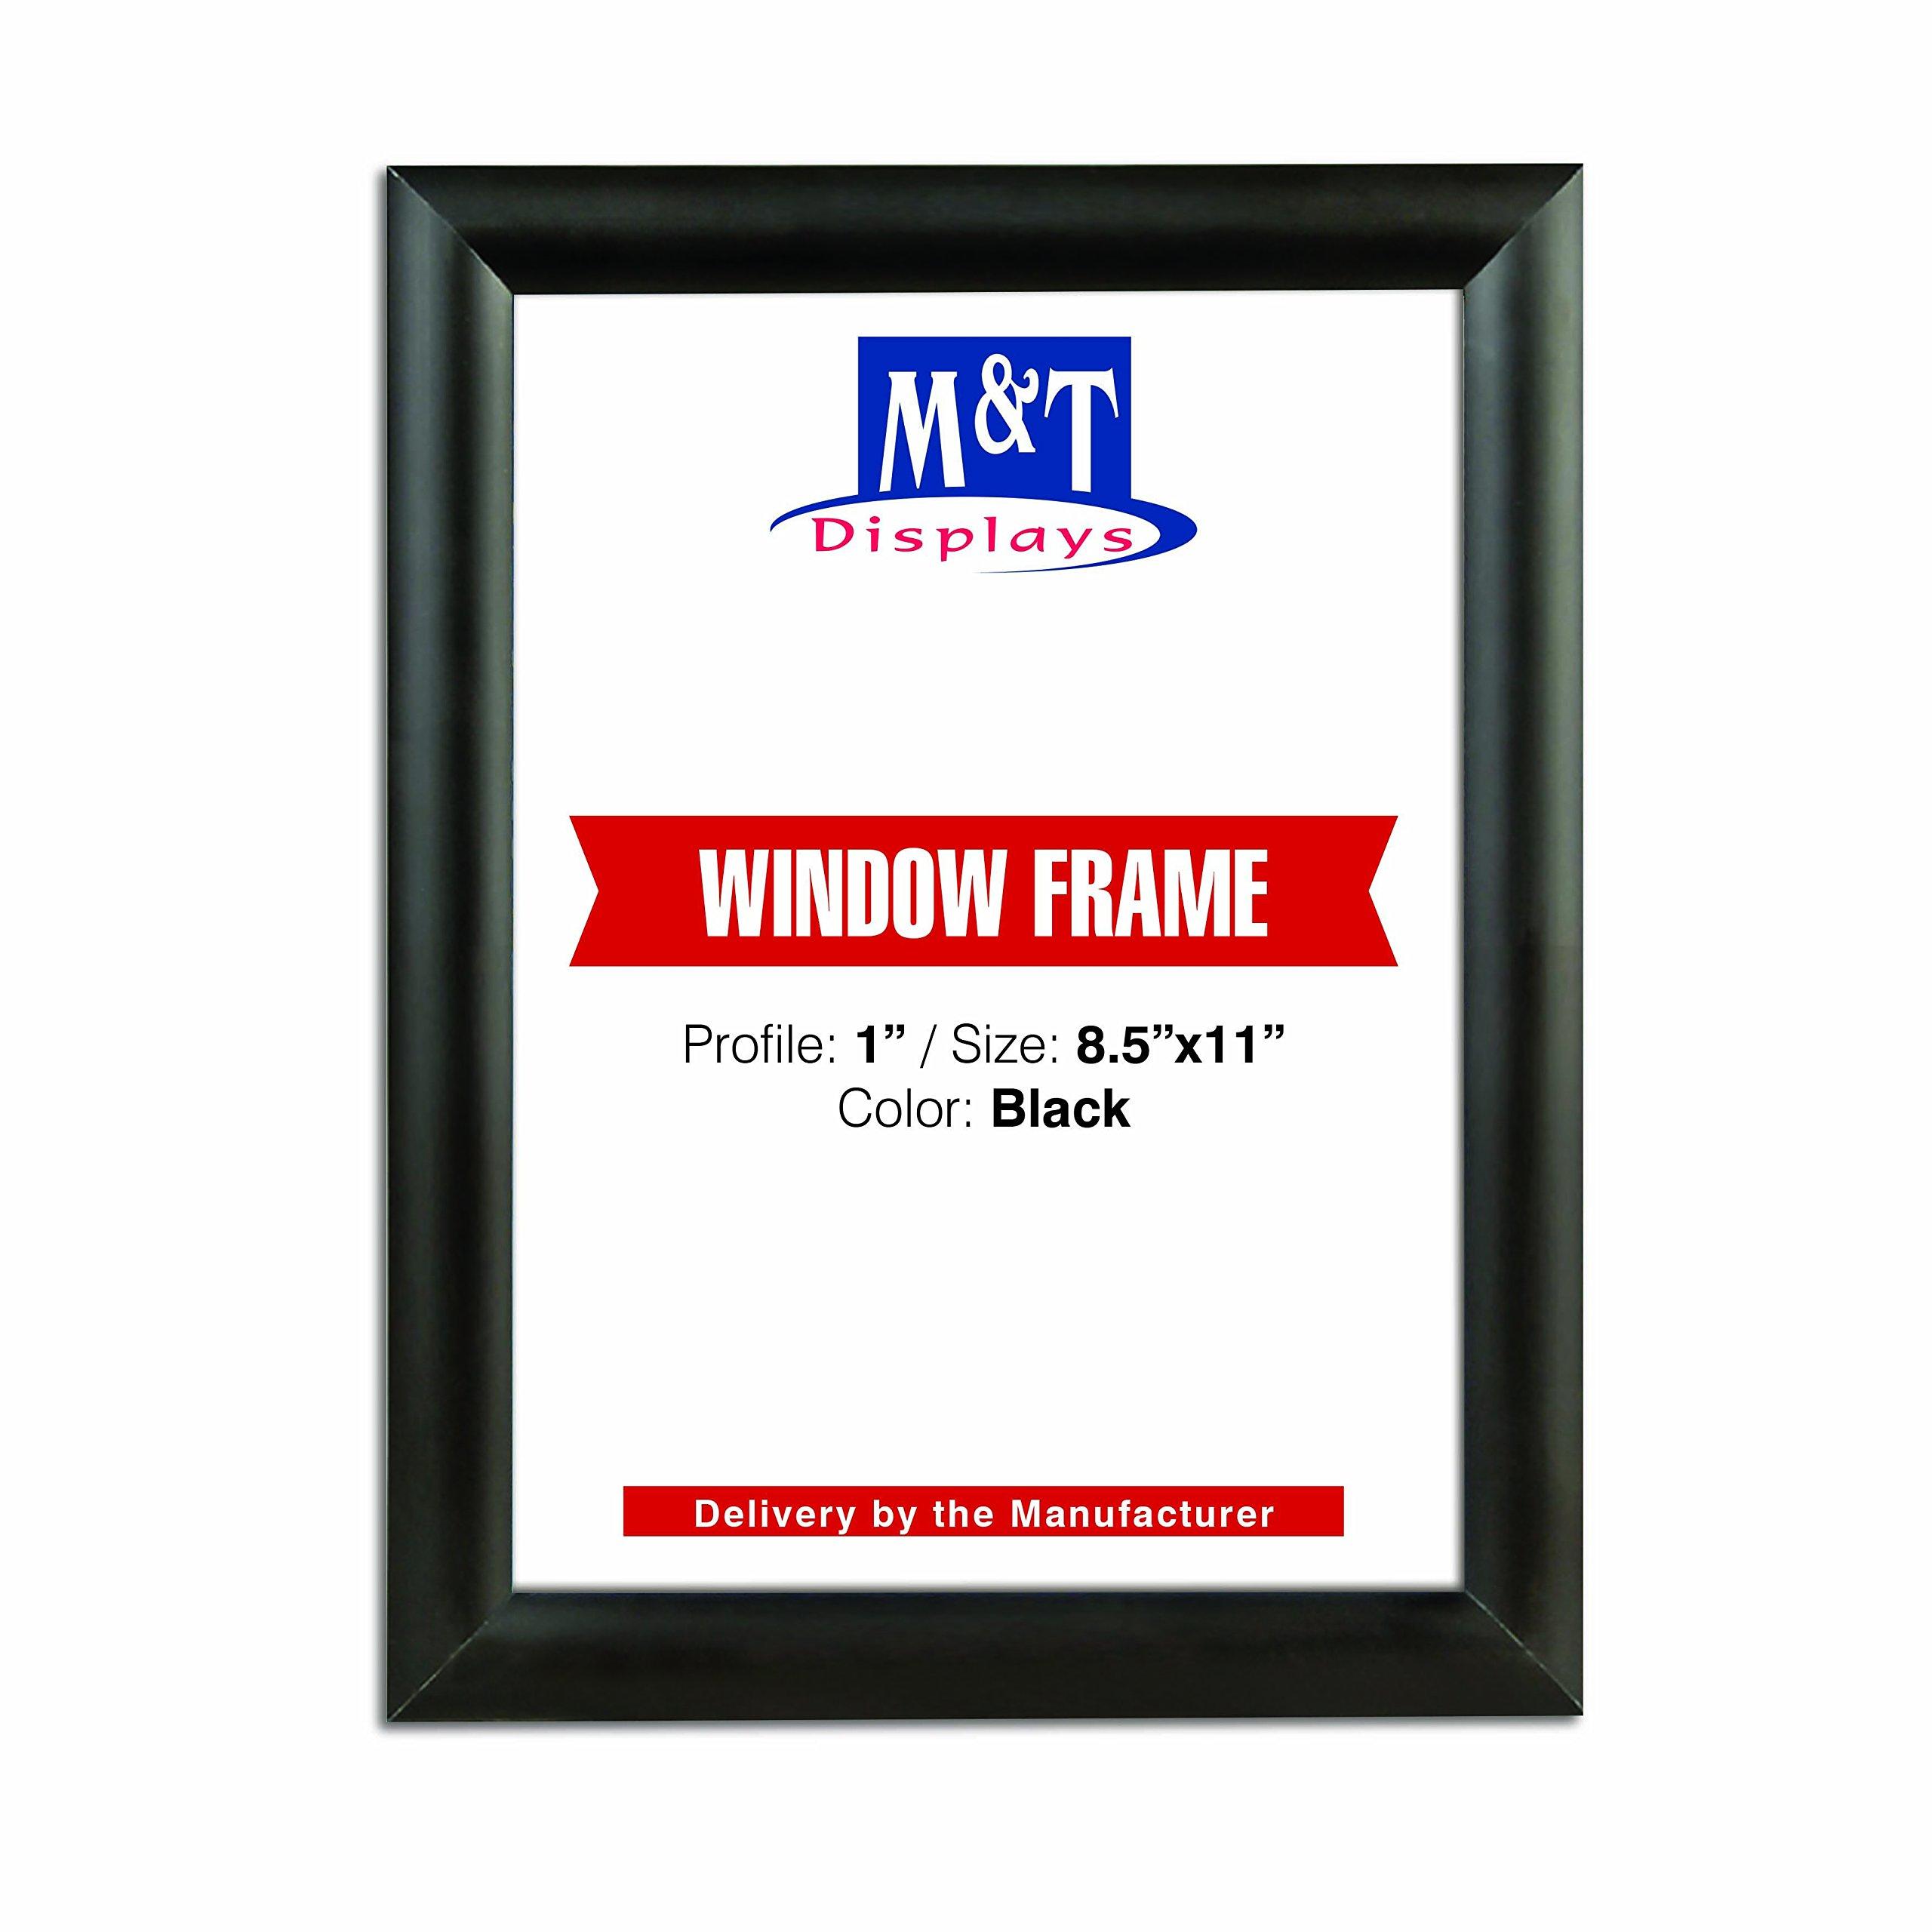 M&T Displays 8.5×11 Window Frame, 1 inch Black Mitered Profile